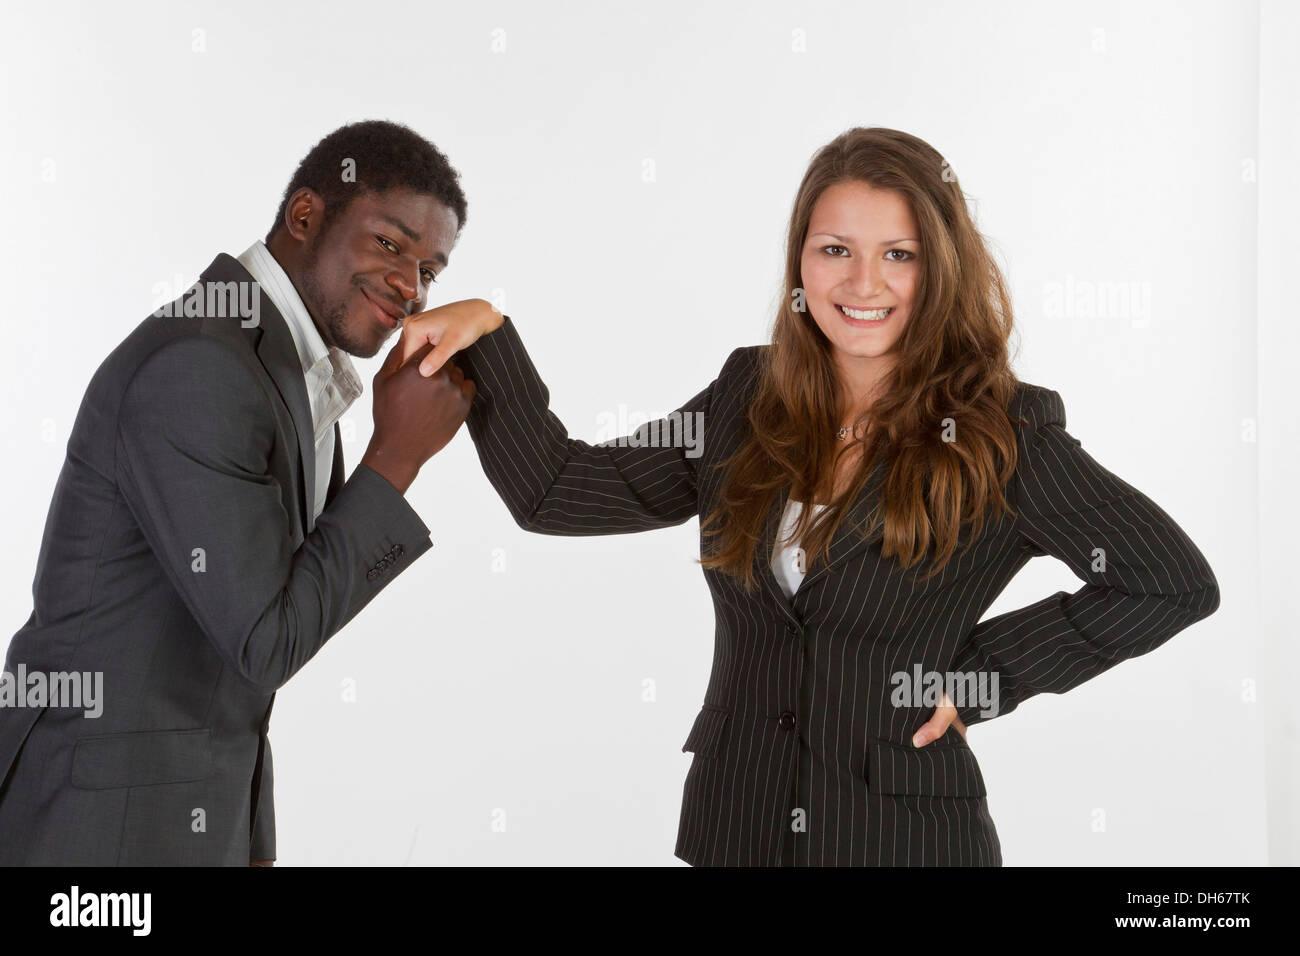 man kisses woman hand